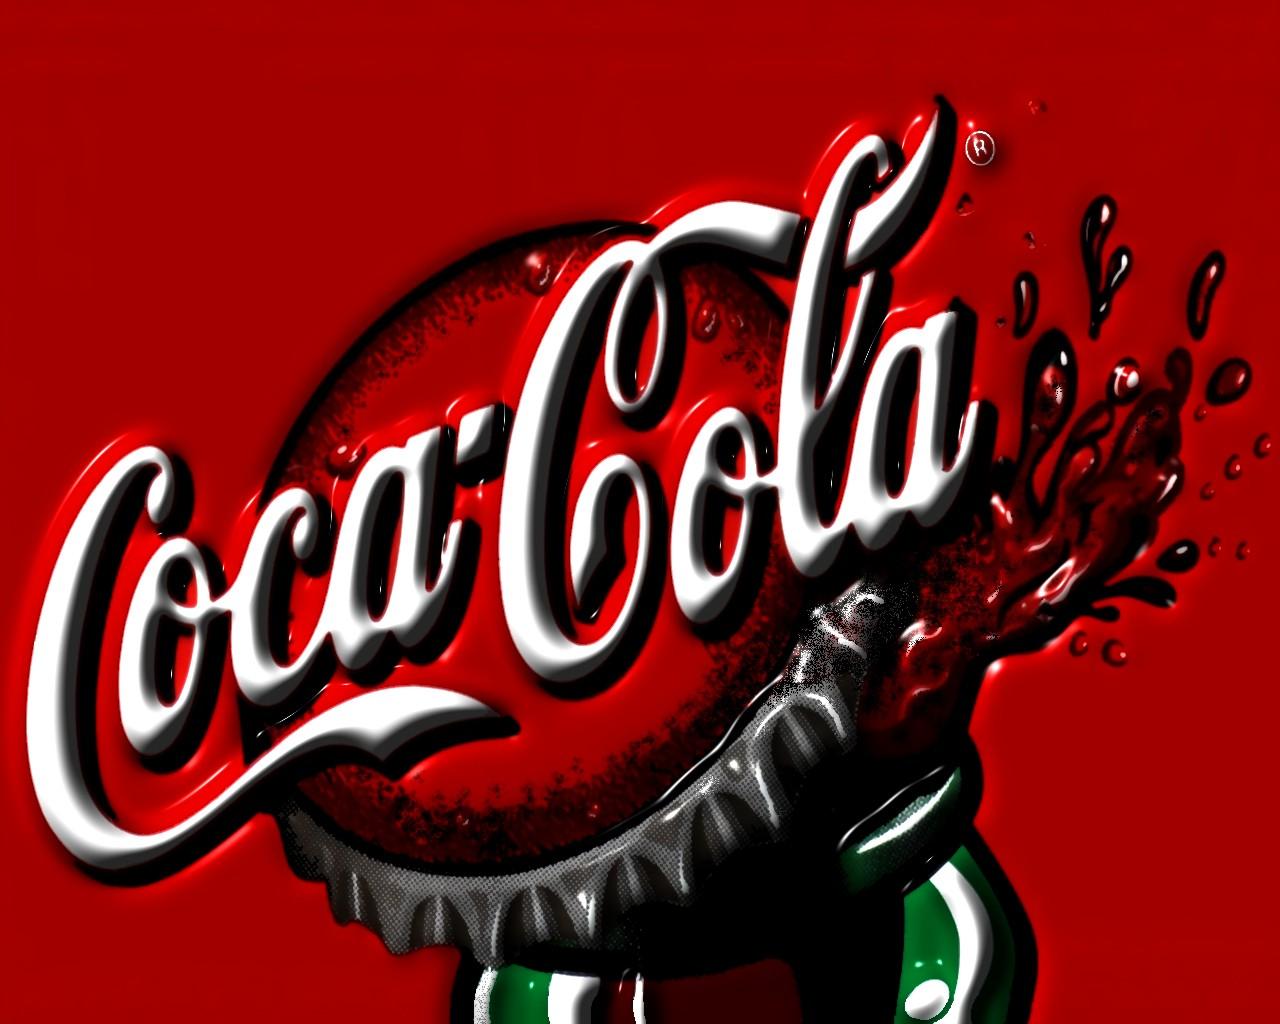 http://1.bp.blogspot.com/-X8iqDsZ8Ems/Tee9NuV1SPI/AAAAAAAAARs/cVKYaG2pzEg/s1600/Coca%25252527Cola%252525202.jpg